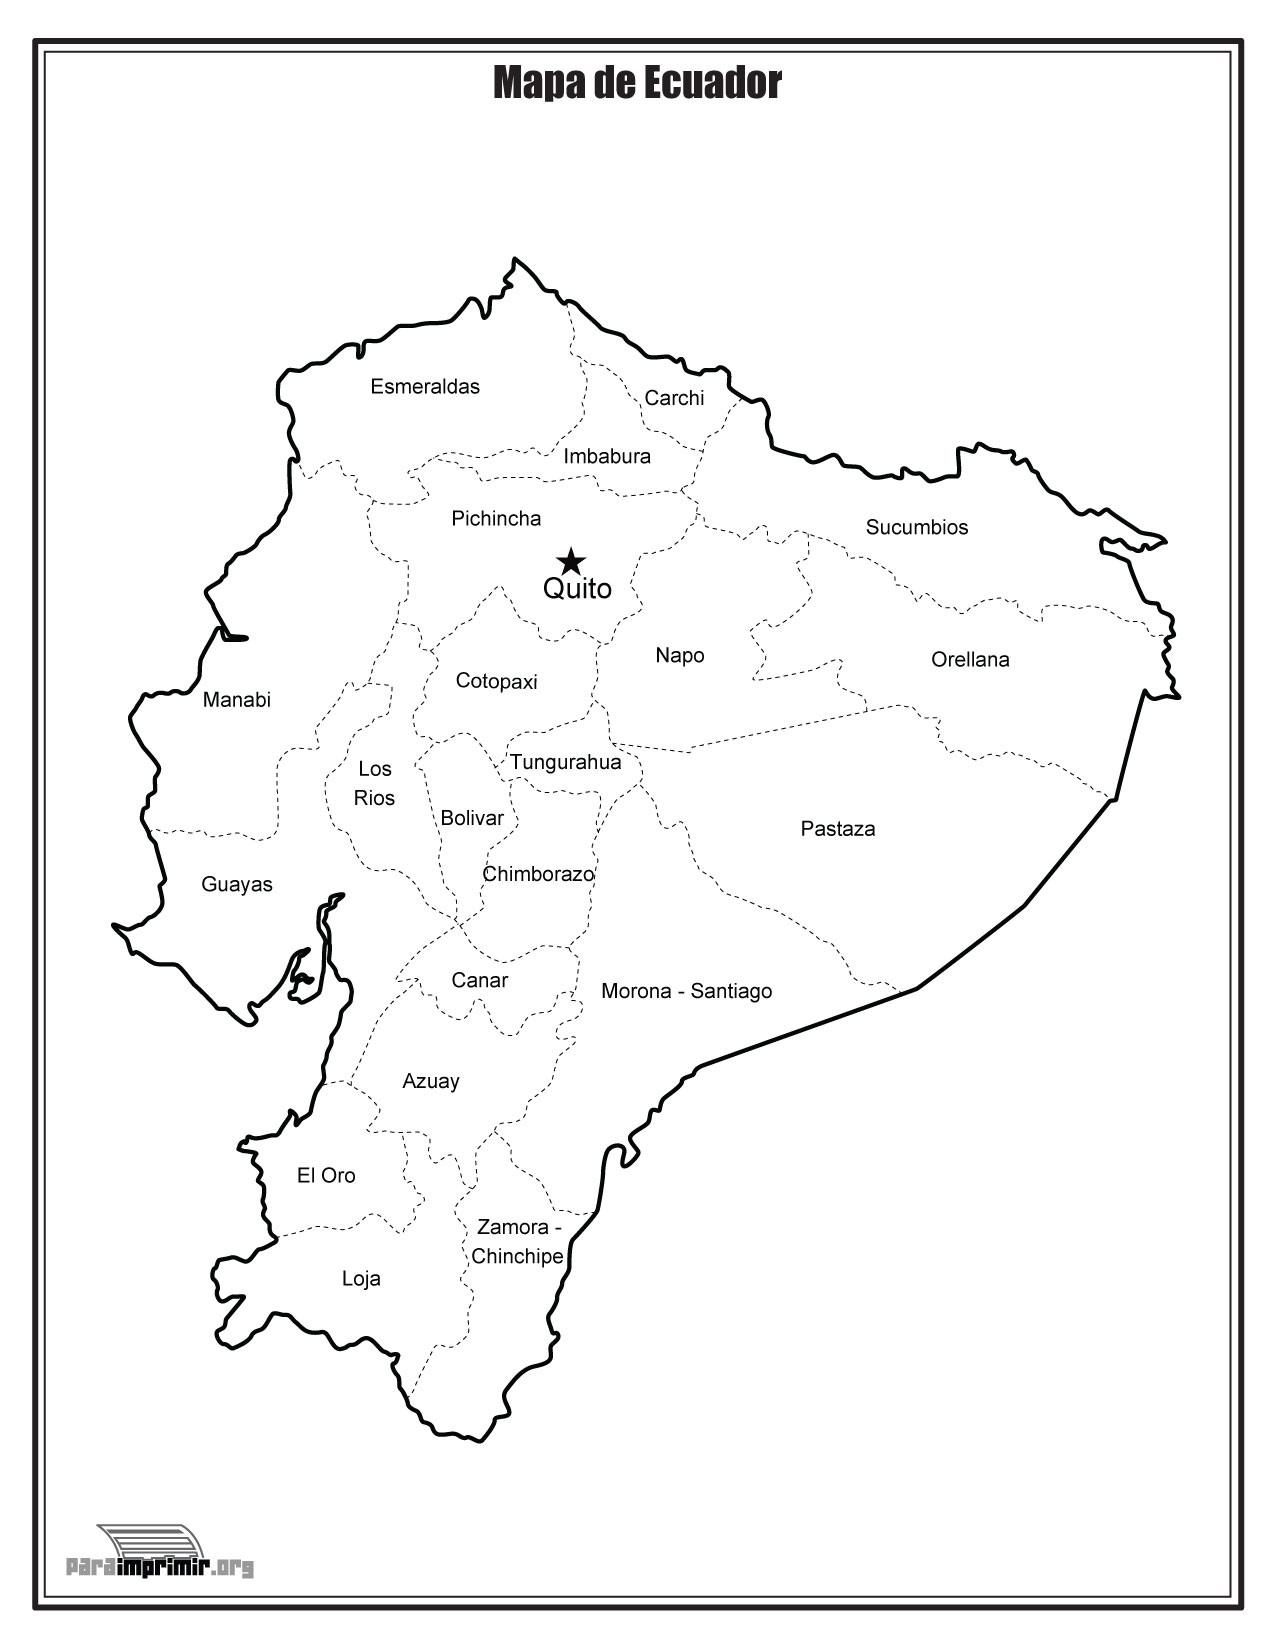 Mapa de Ecuador con nombres para imprimir